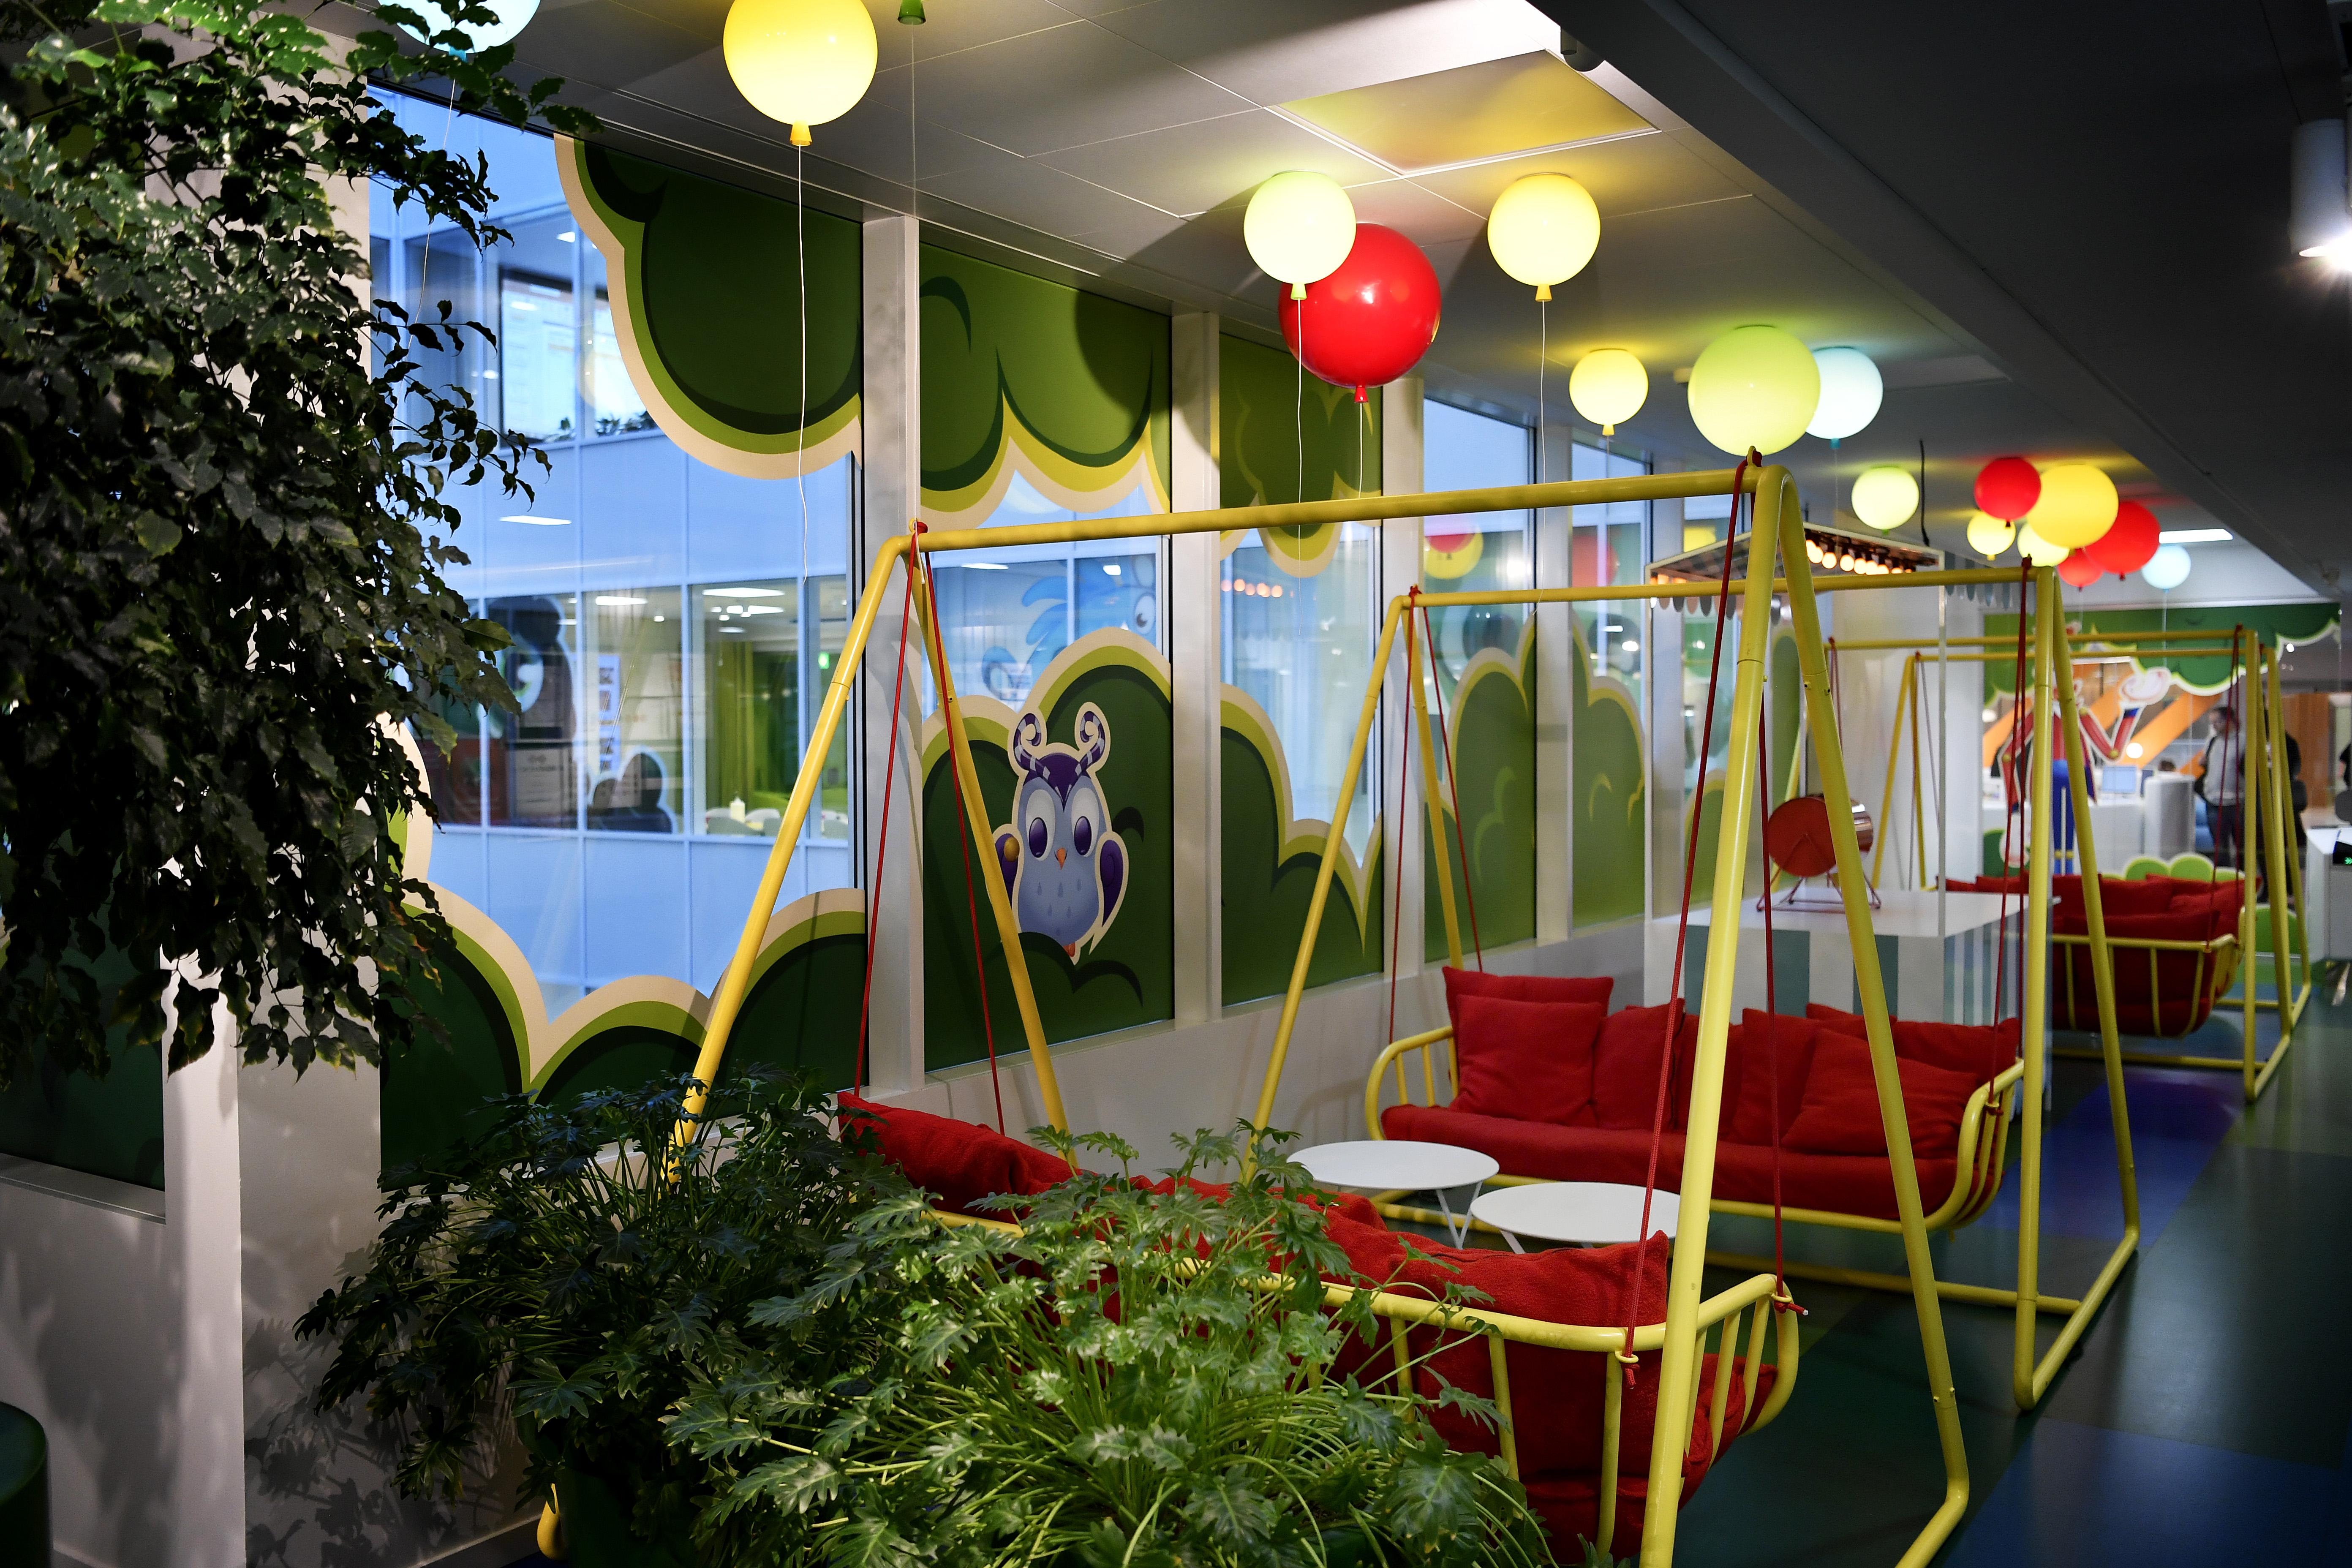 King Office Hangout